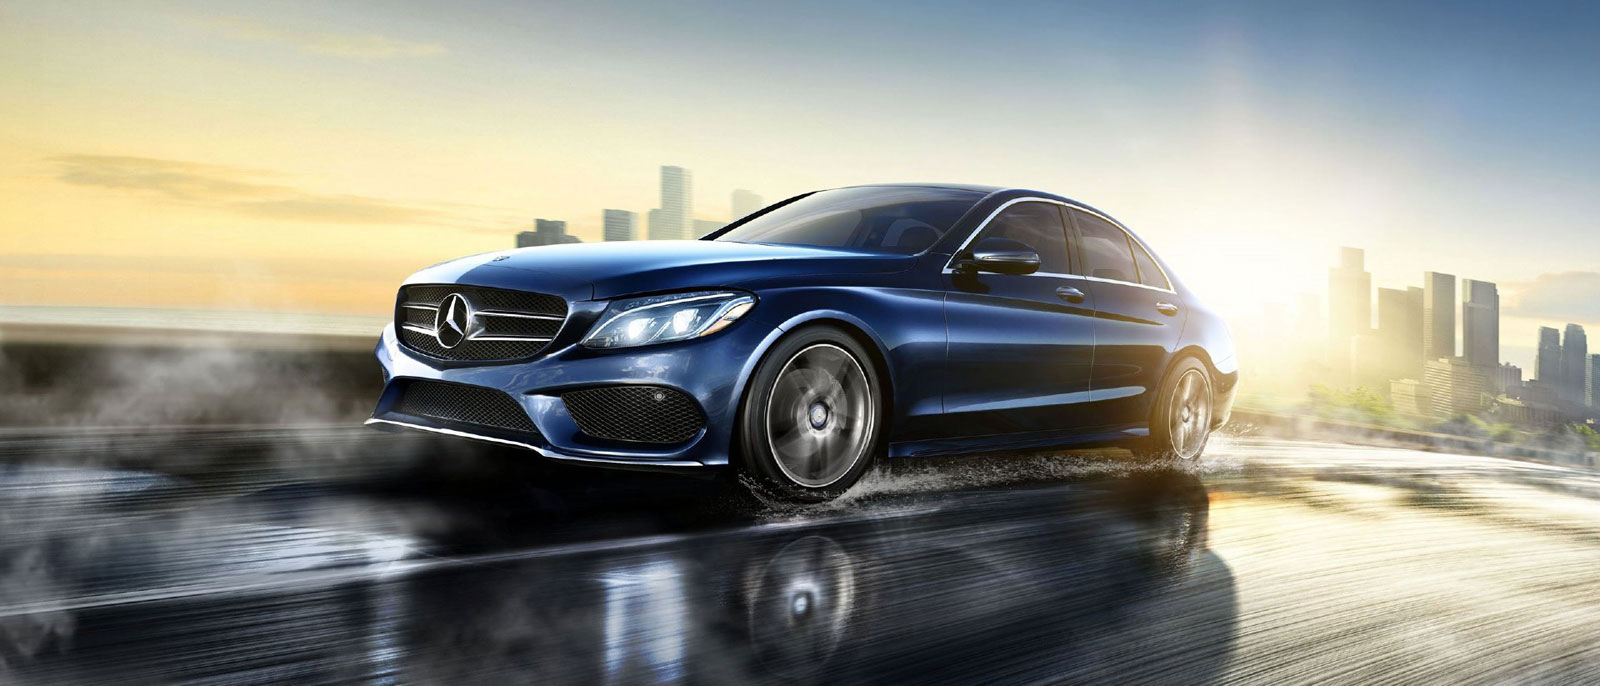 2016 Mercedes-Benz C300 Sedan